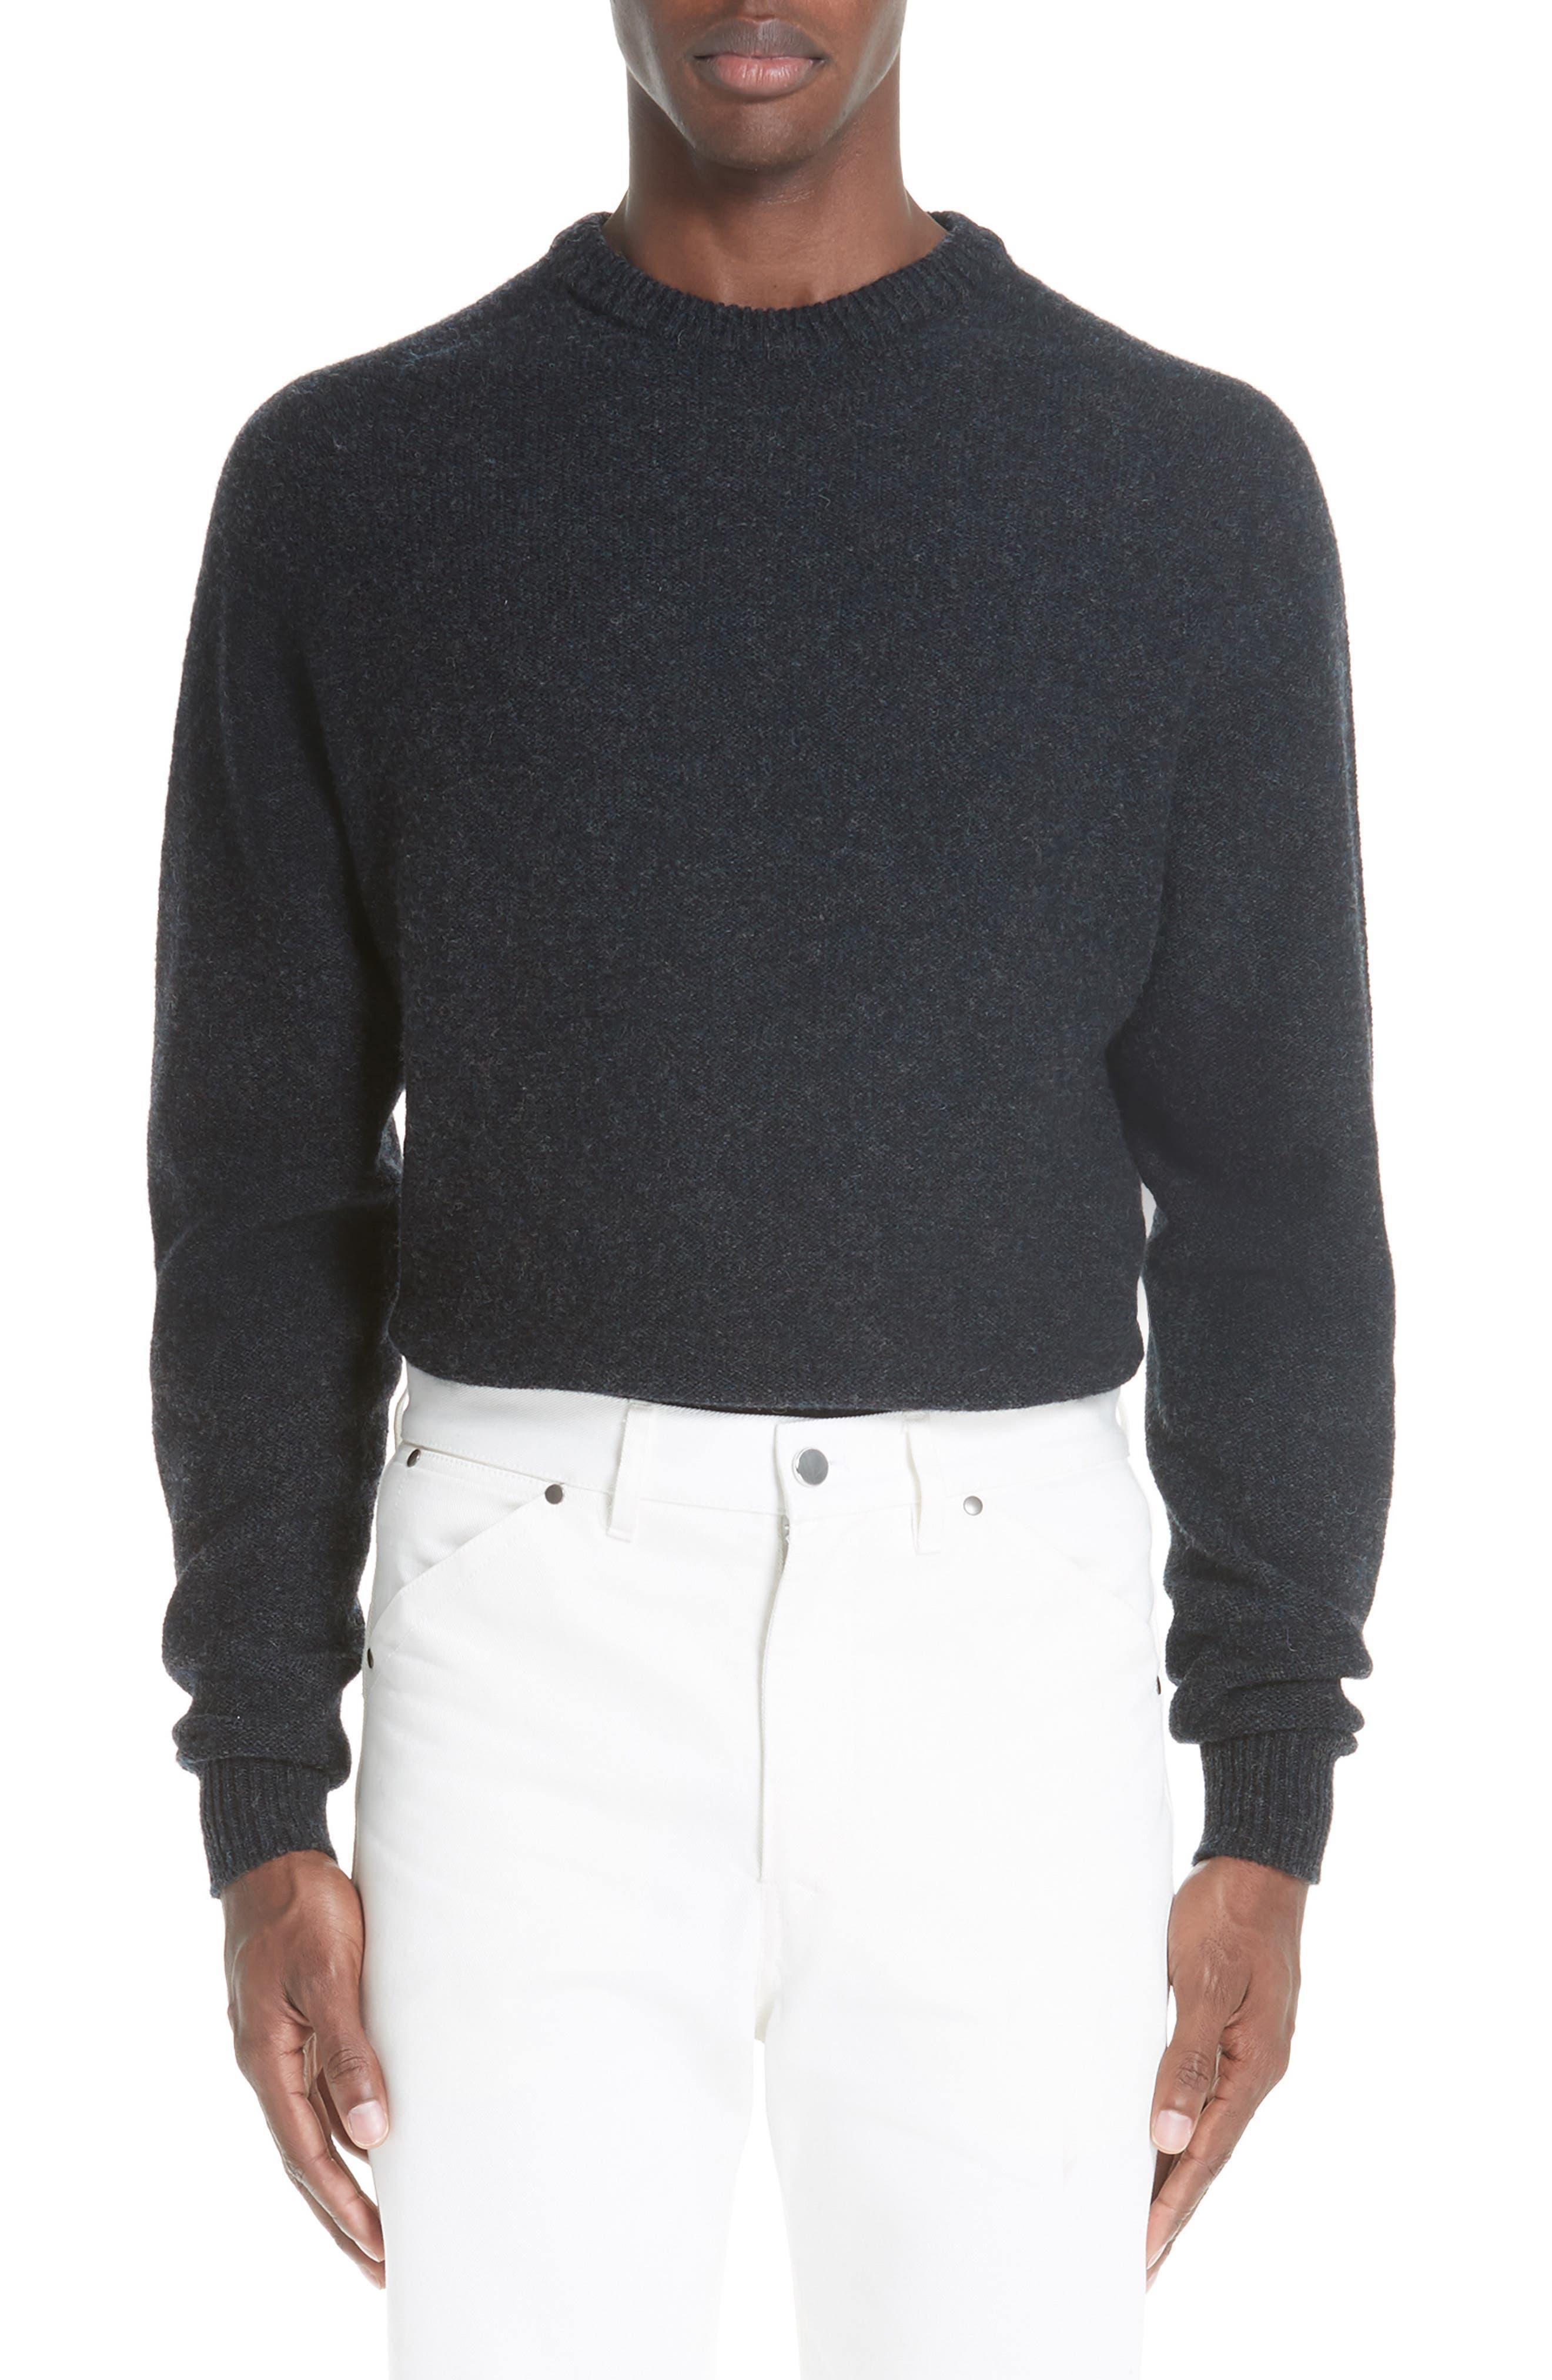 Lemaire Crew Seamless Merino Sweater, Black